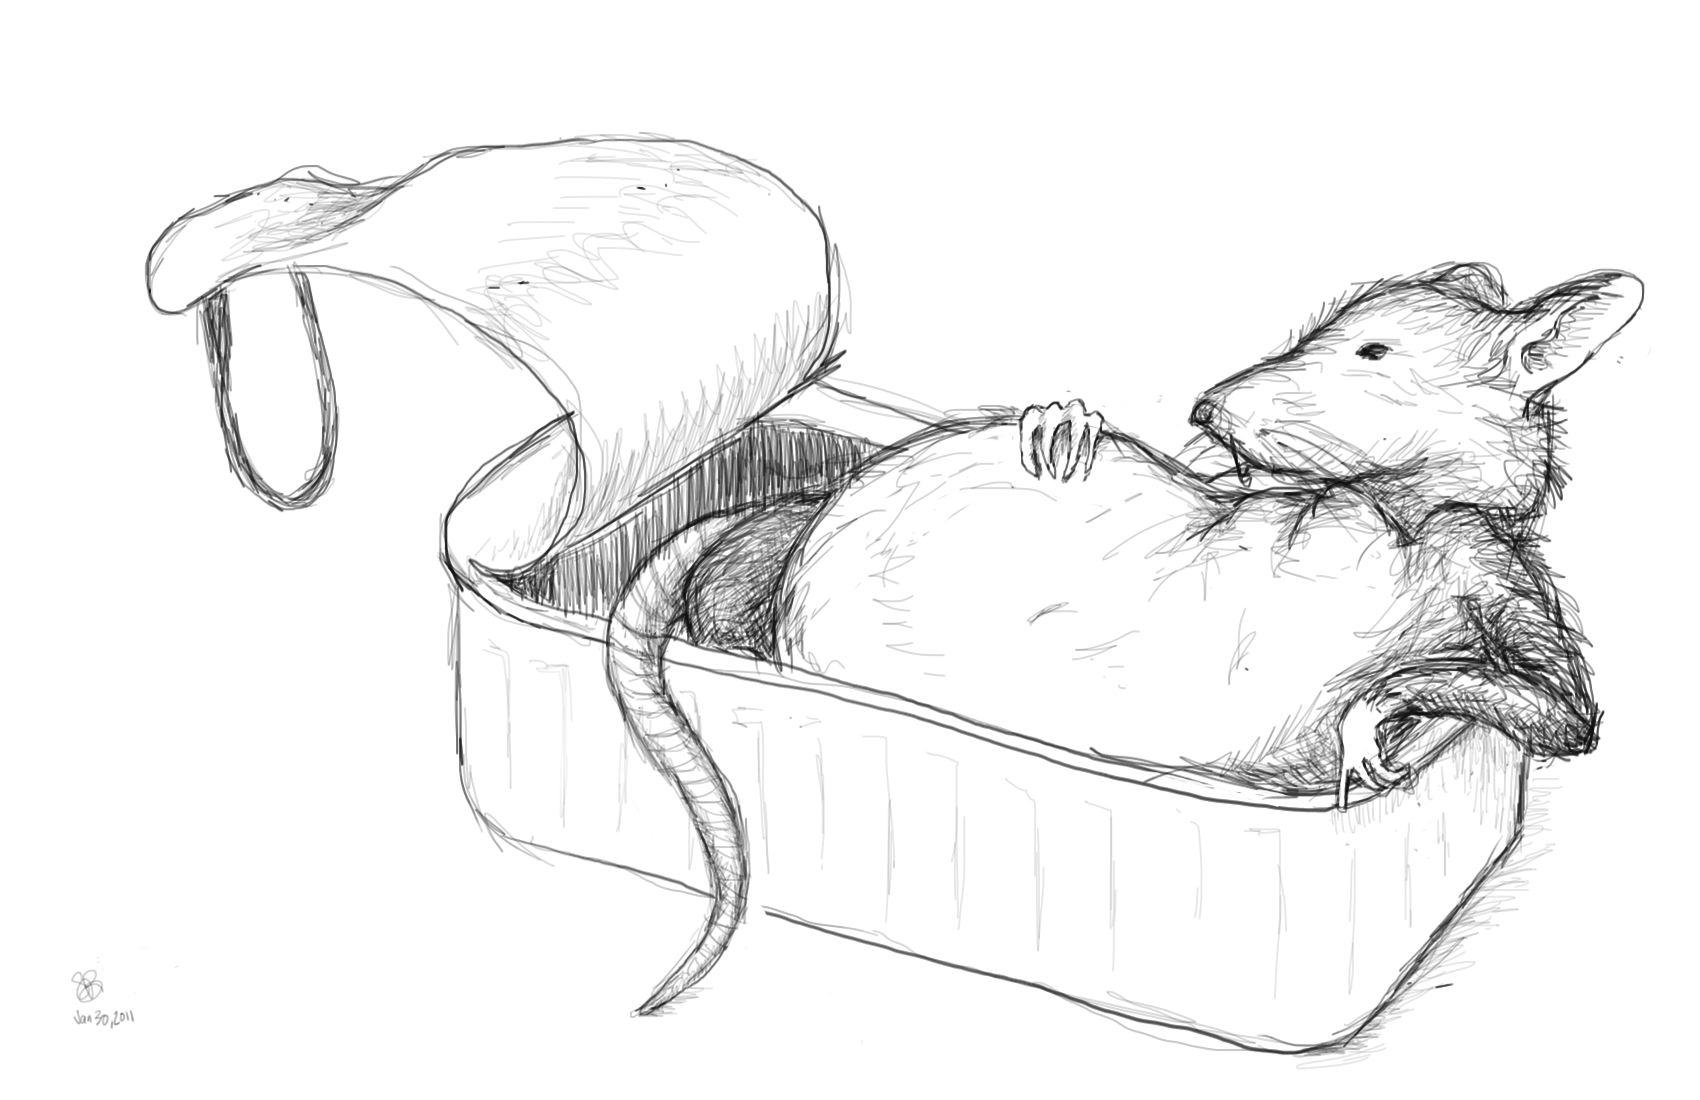 Drawn rat impossible Rat Drawings Easy Easy in